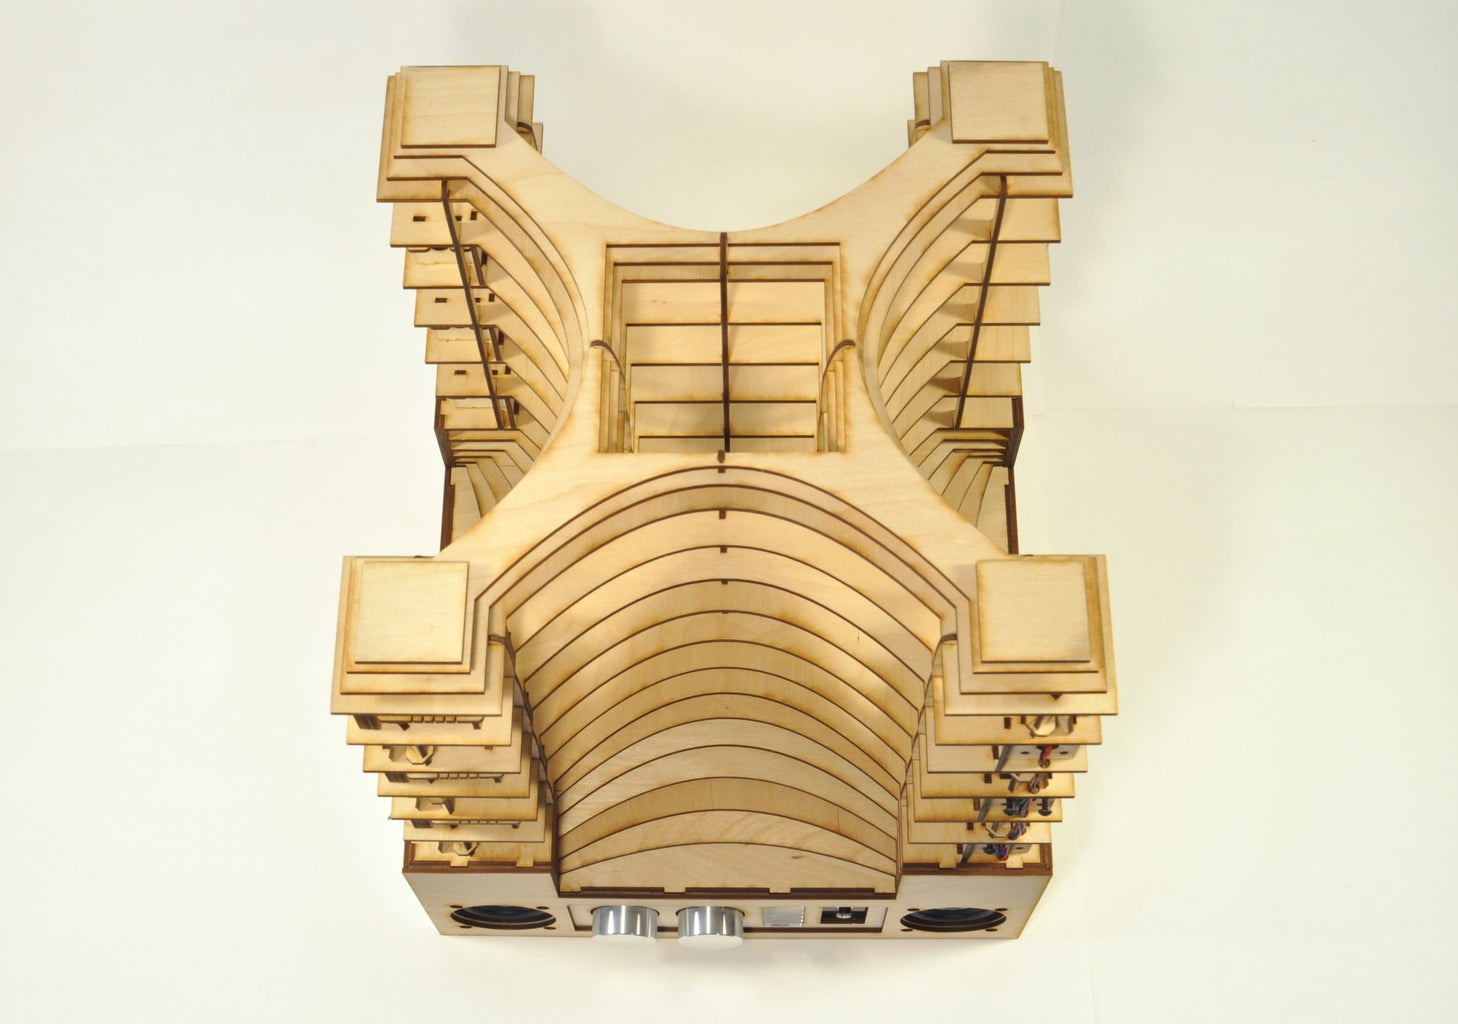 Upright Laser Harp